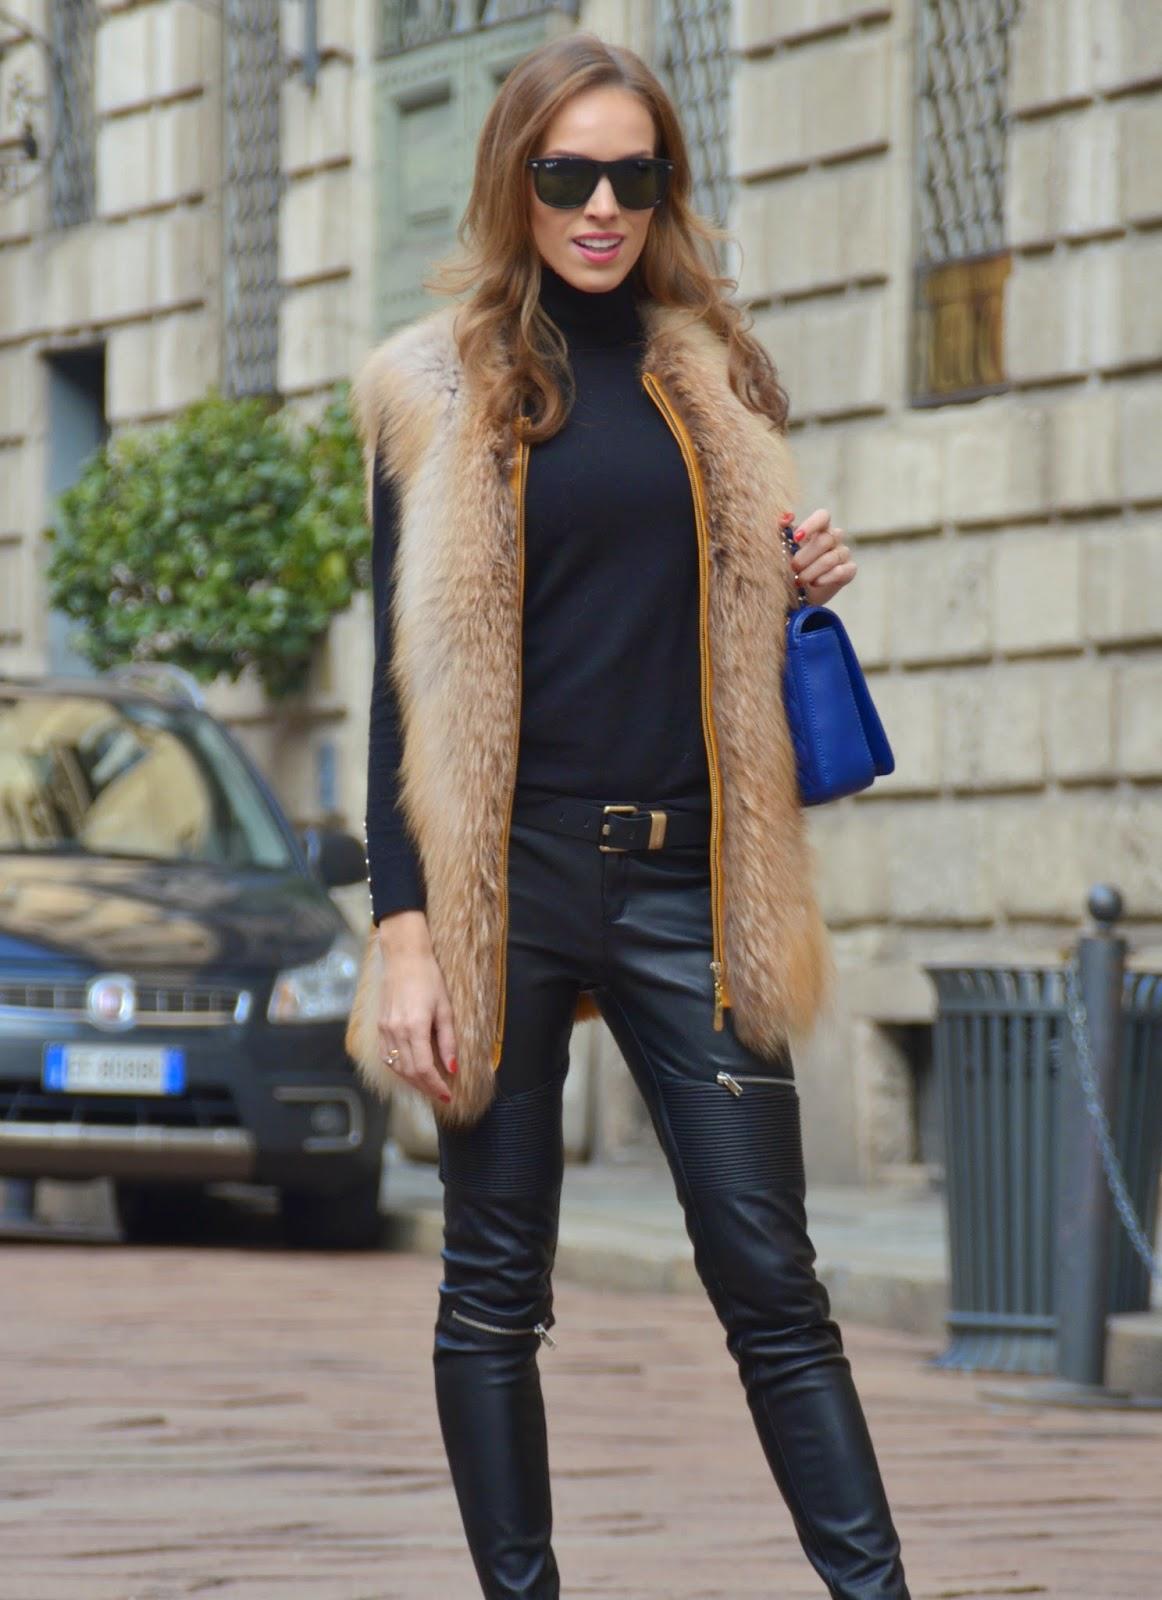 ray-ban-sunglasses-fur-vest-leather-zipper-trousers-calvin-klein-belt